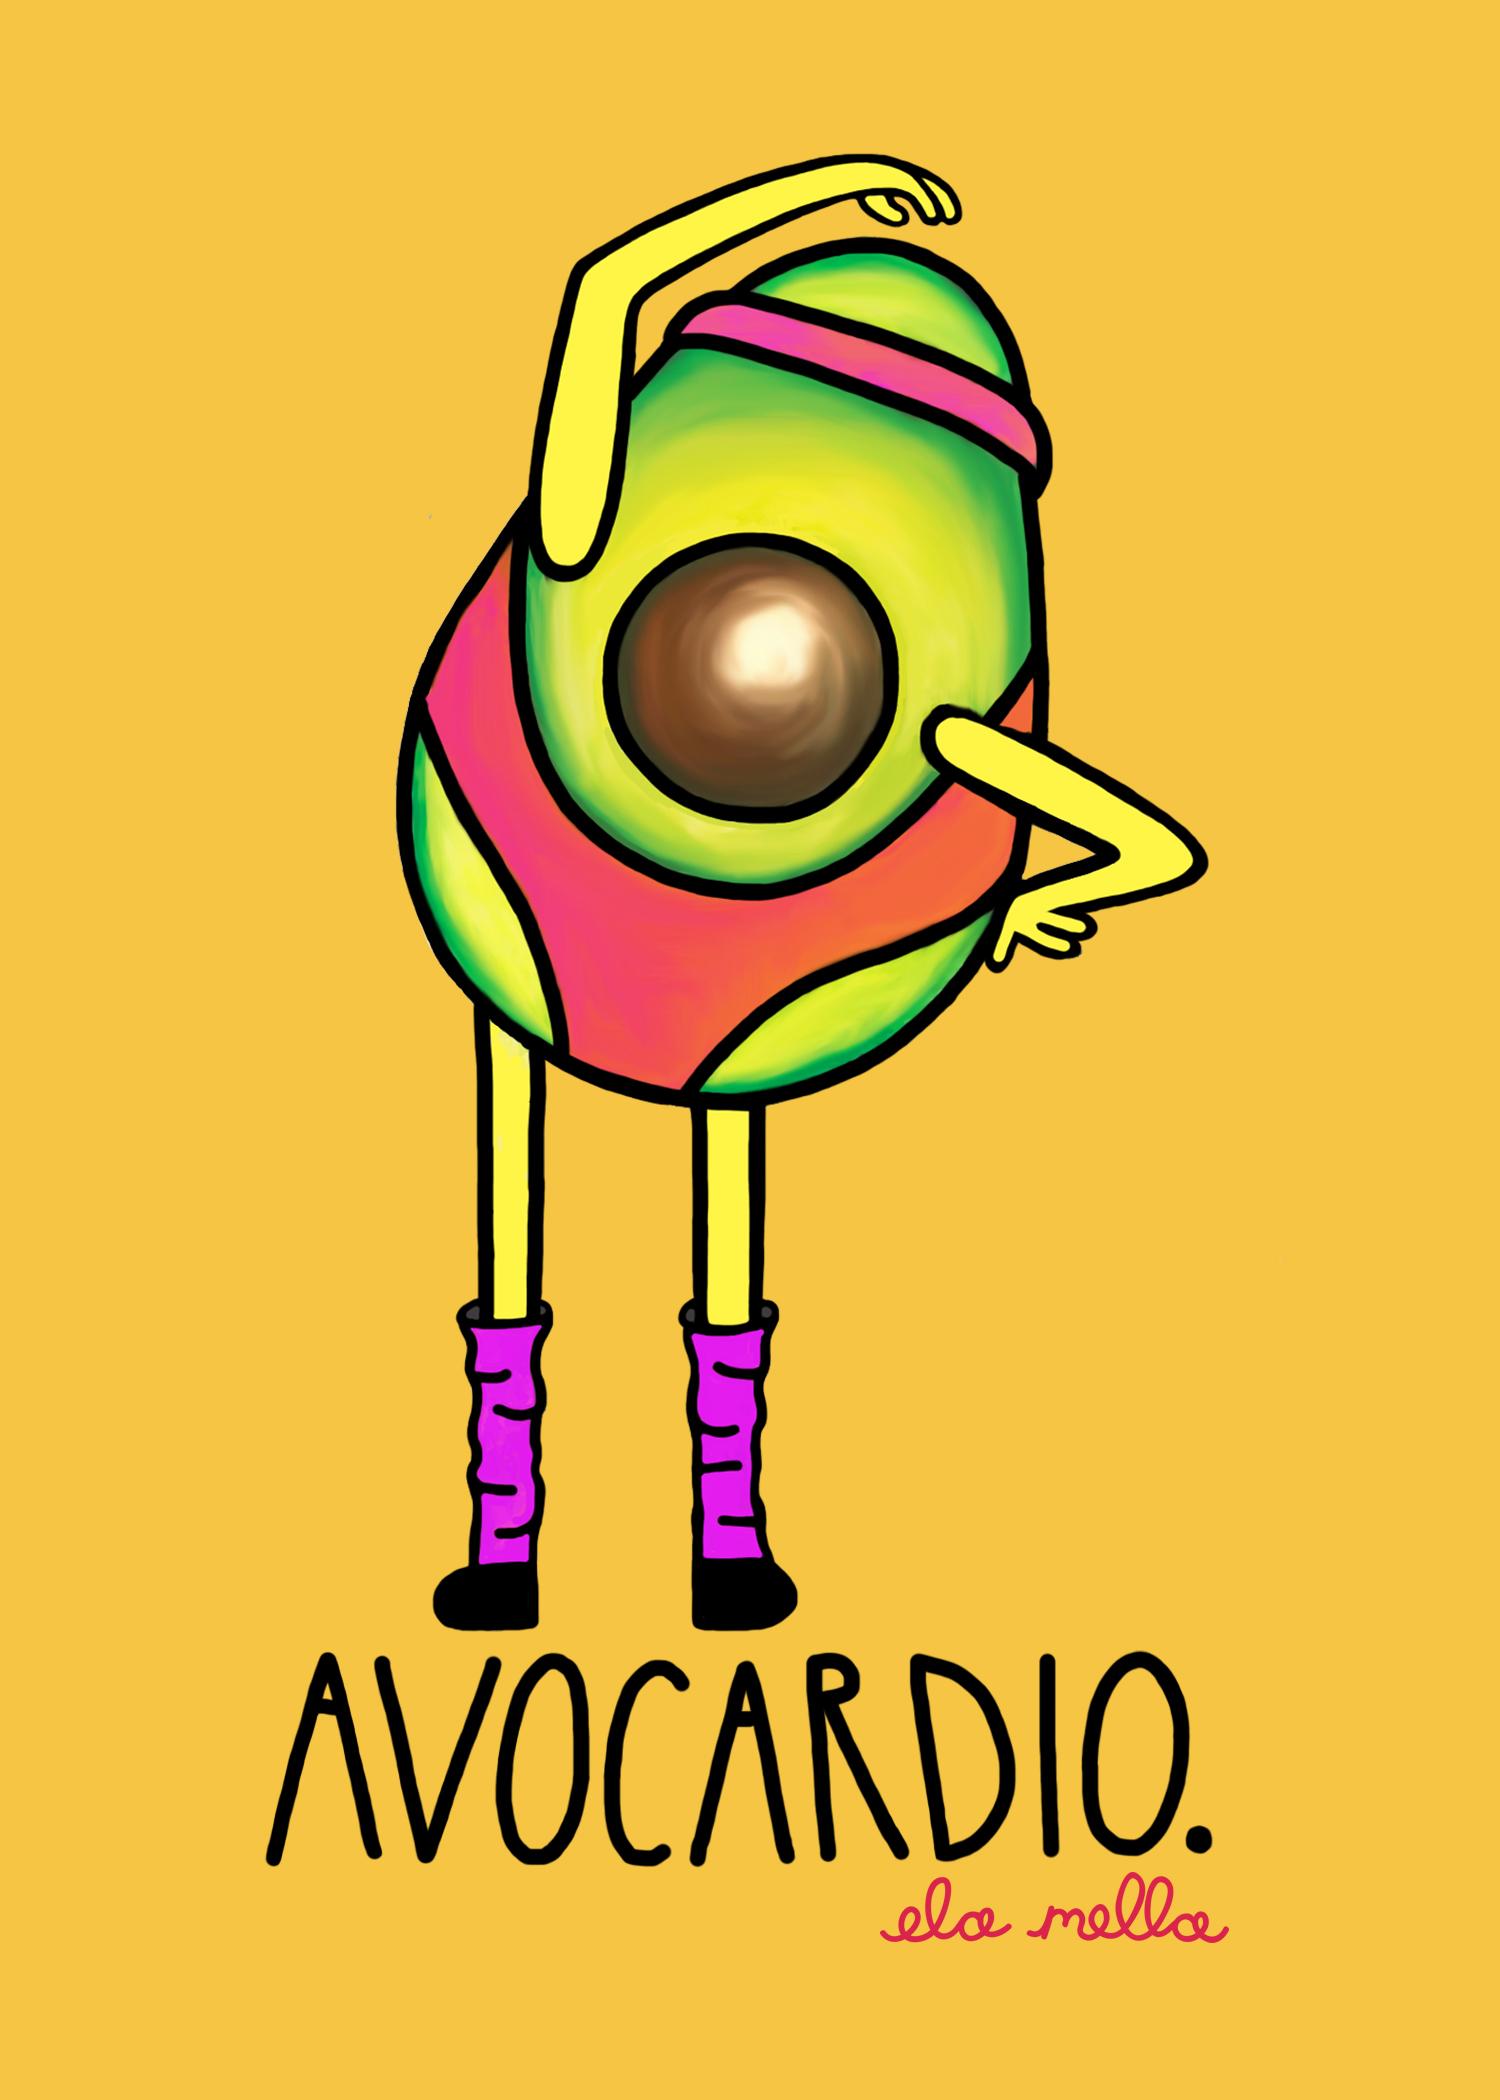 avocardio.jpg